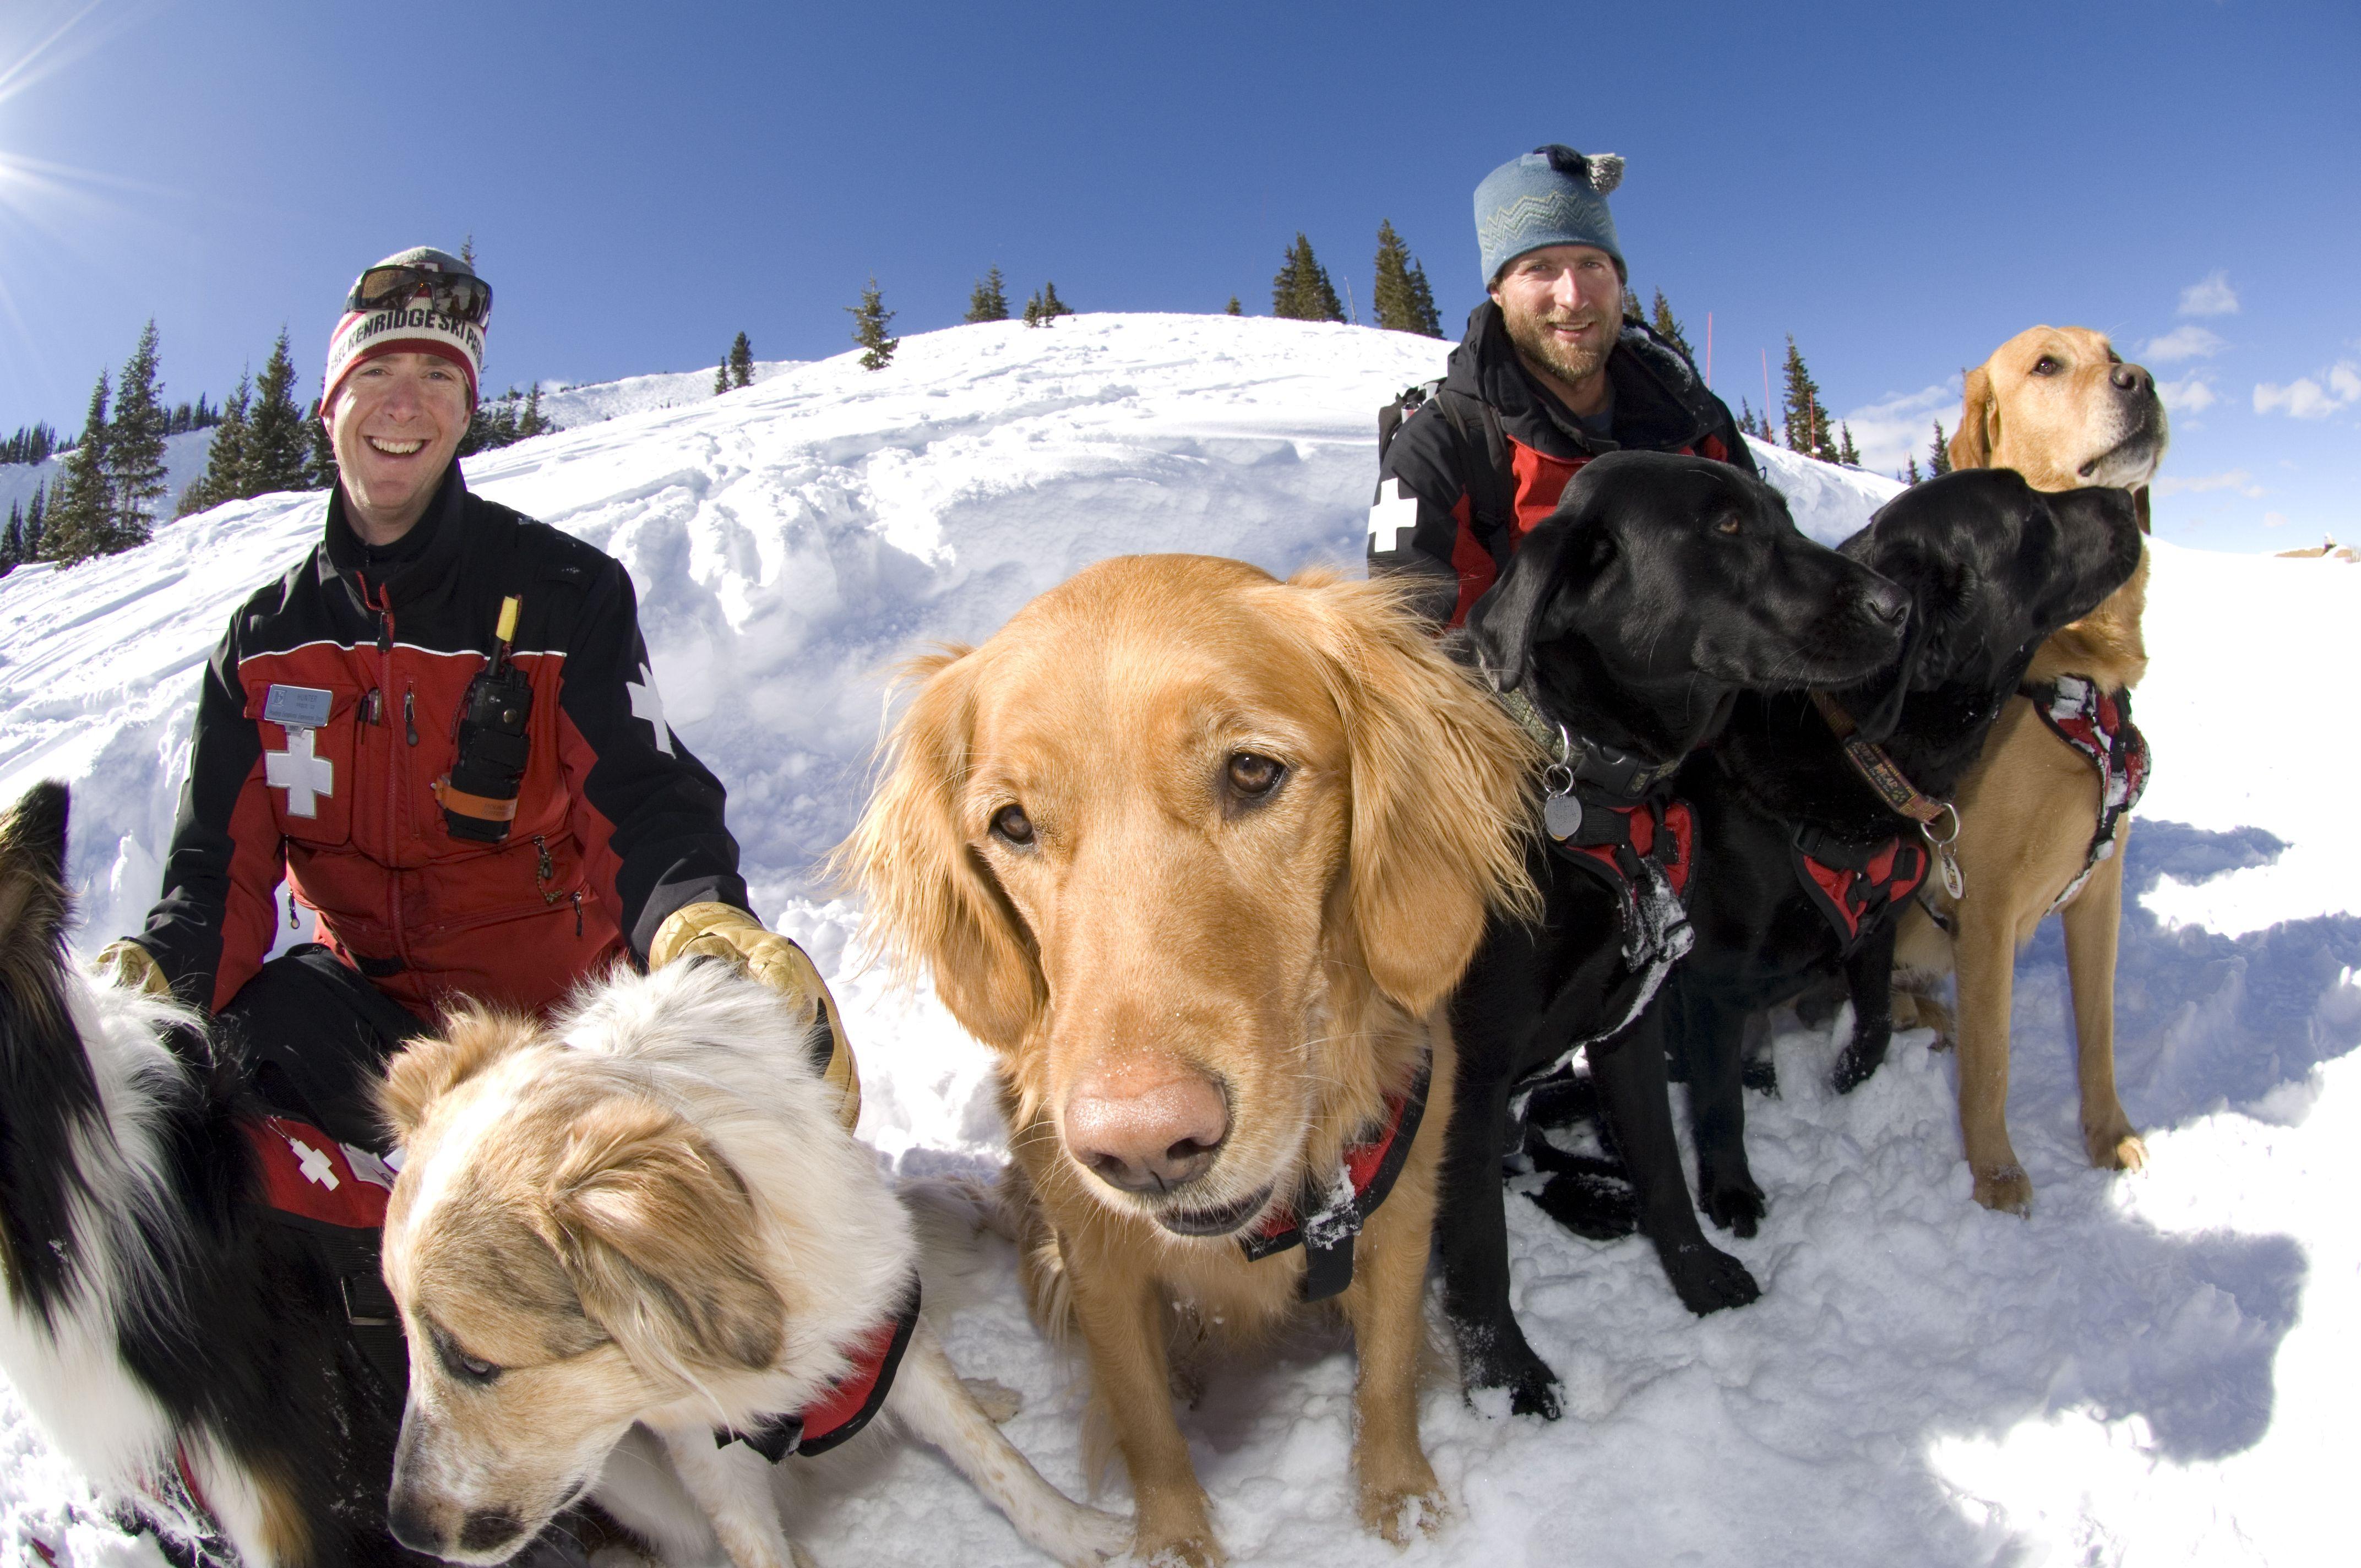 Ski Patrol Dogs Enjoy The Sunshine At Breckenridge Ski Resort